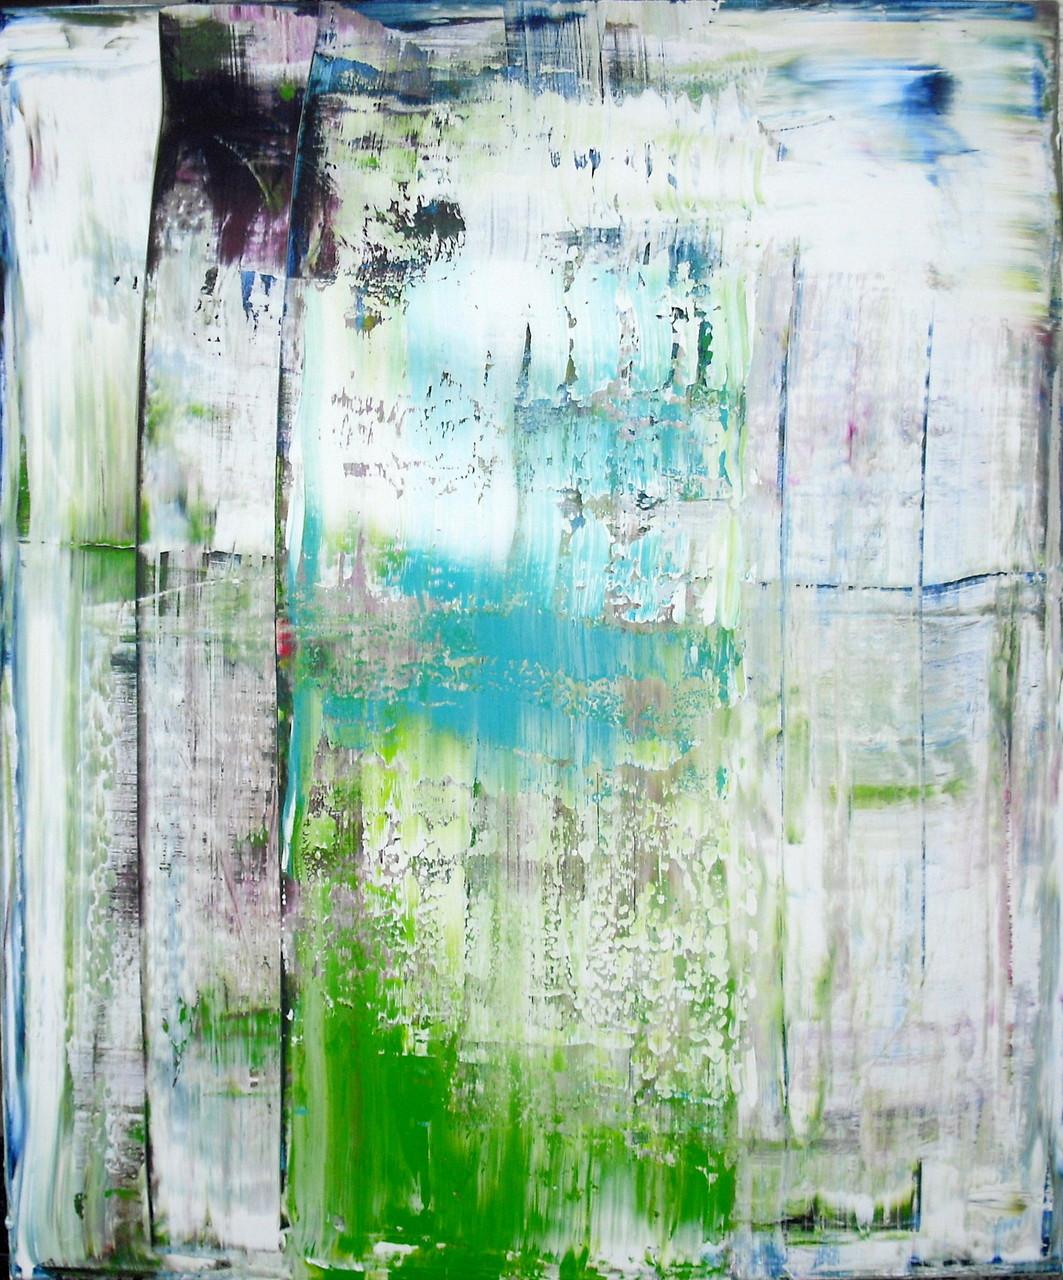 'Frühlingserwachen' (Acrylic on Canvas, 120x100cm)